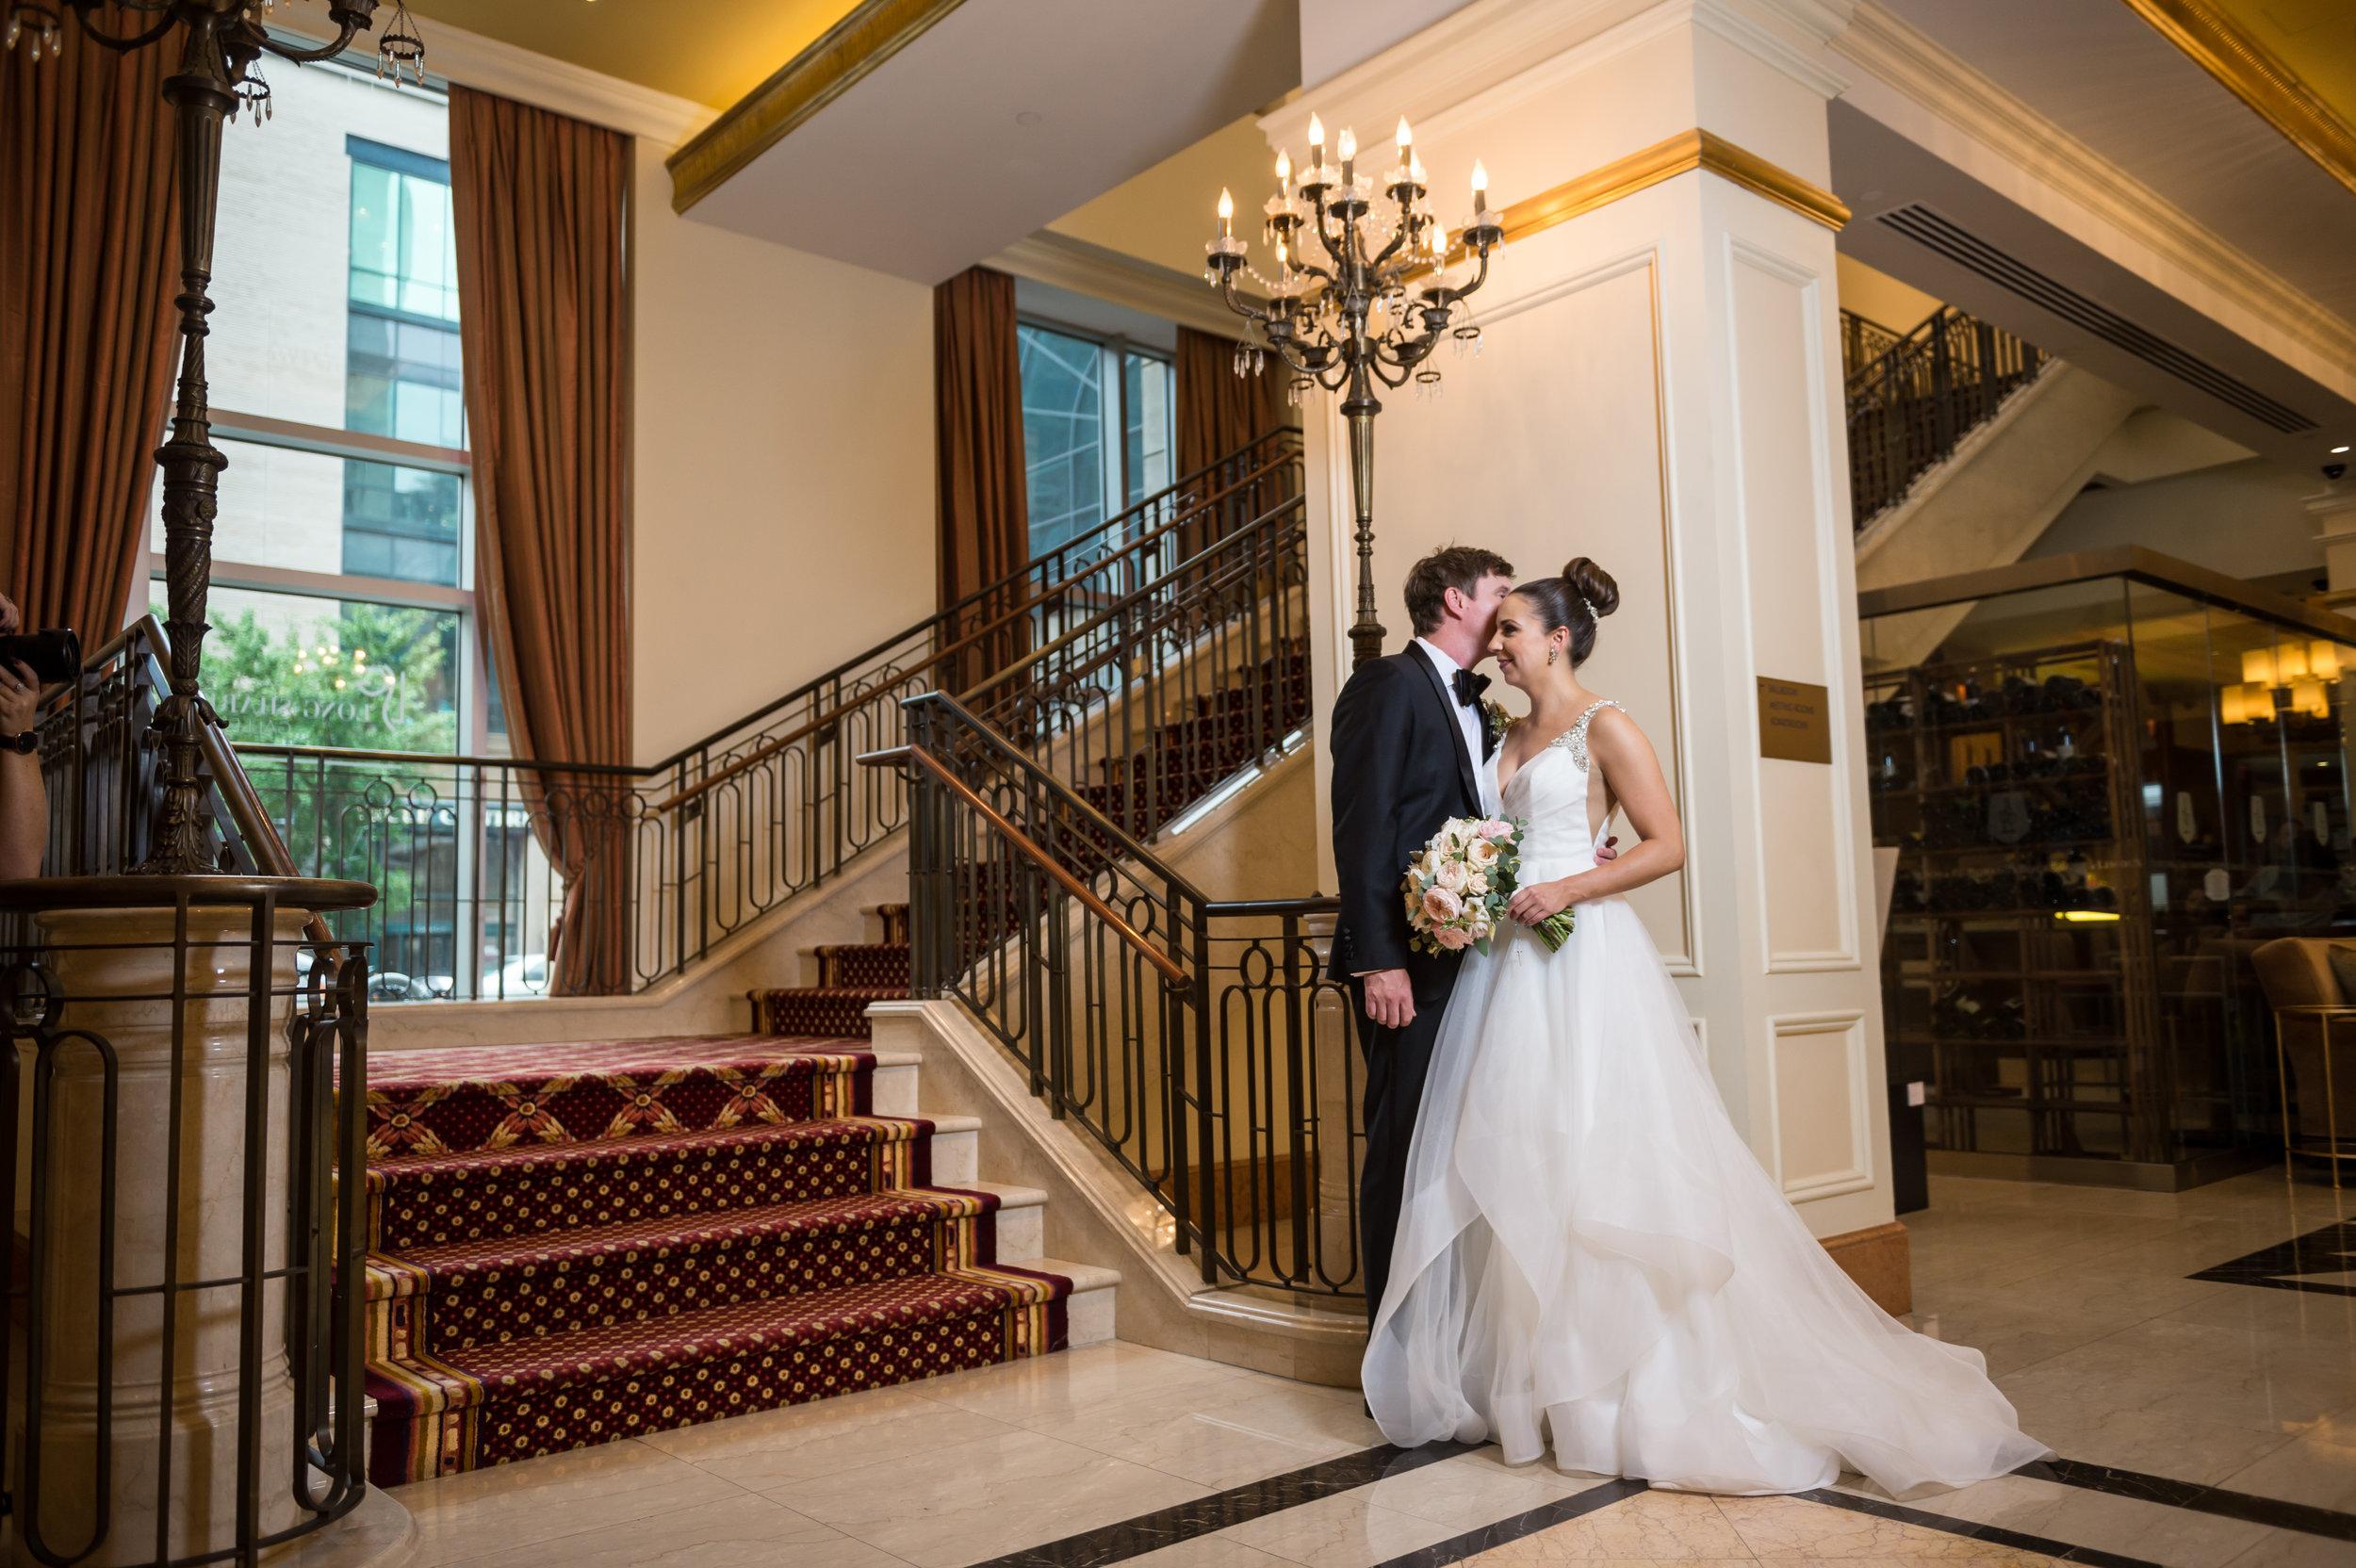 DaussFOTO Wedding Photography_20180908_0377.jpg